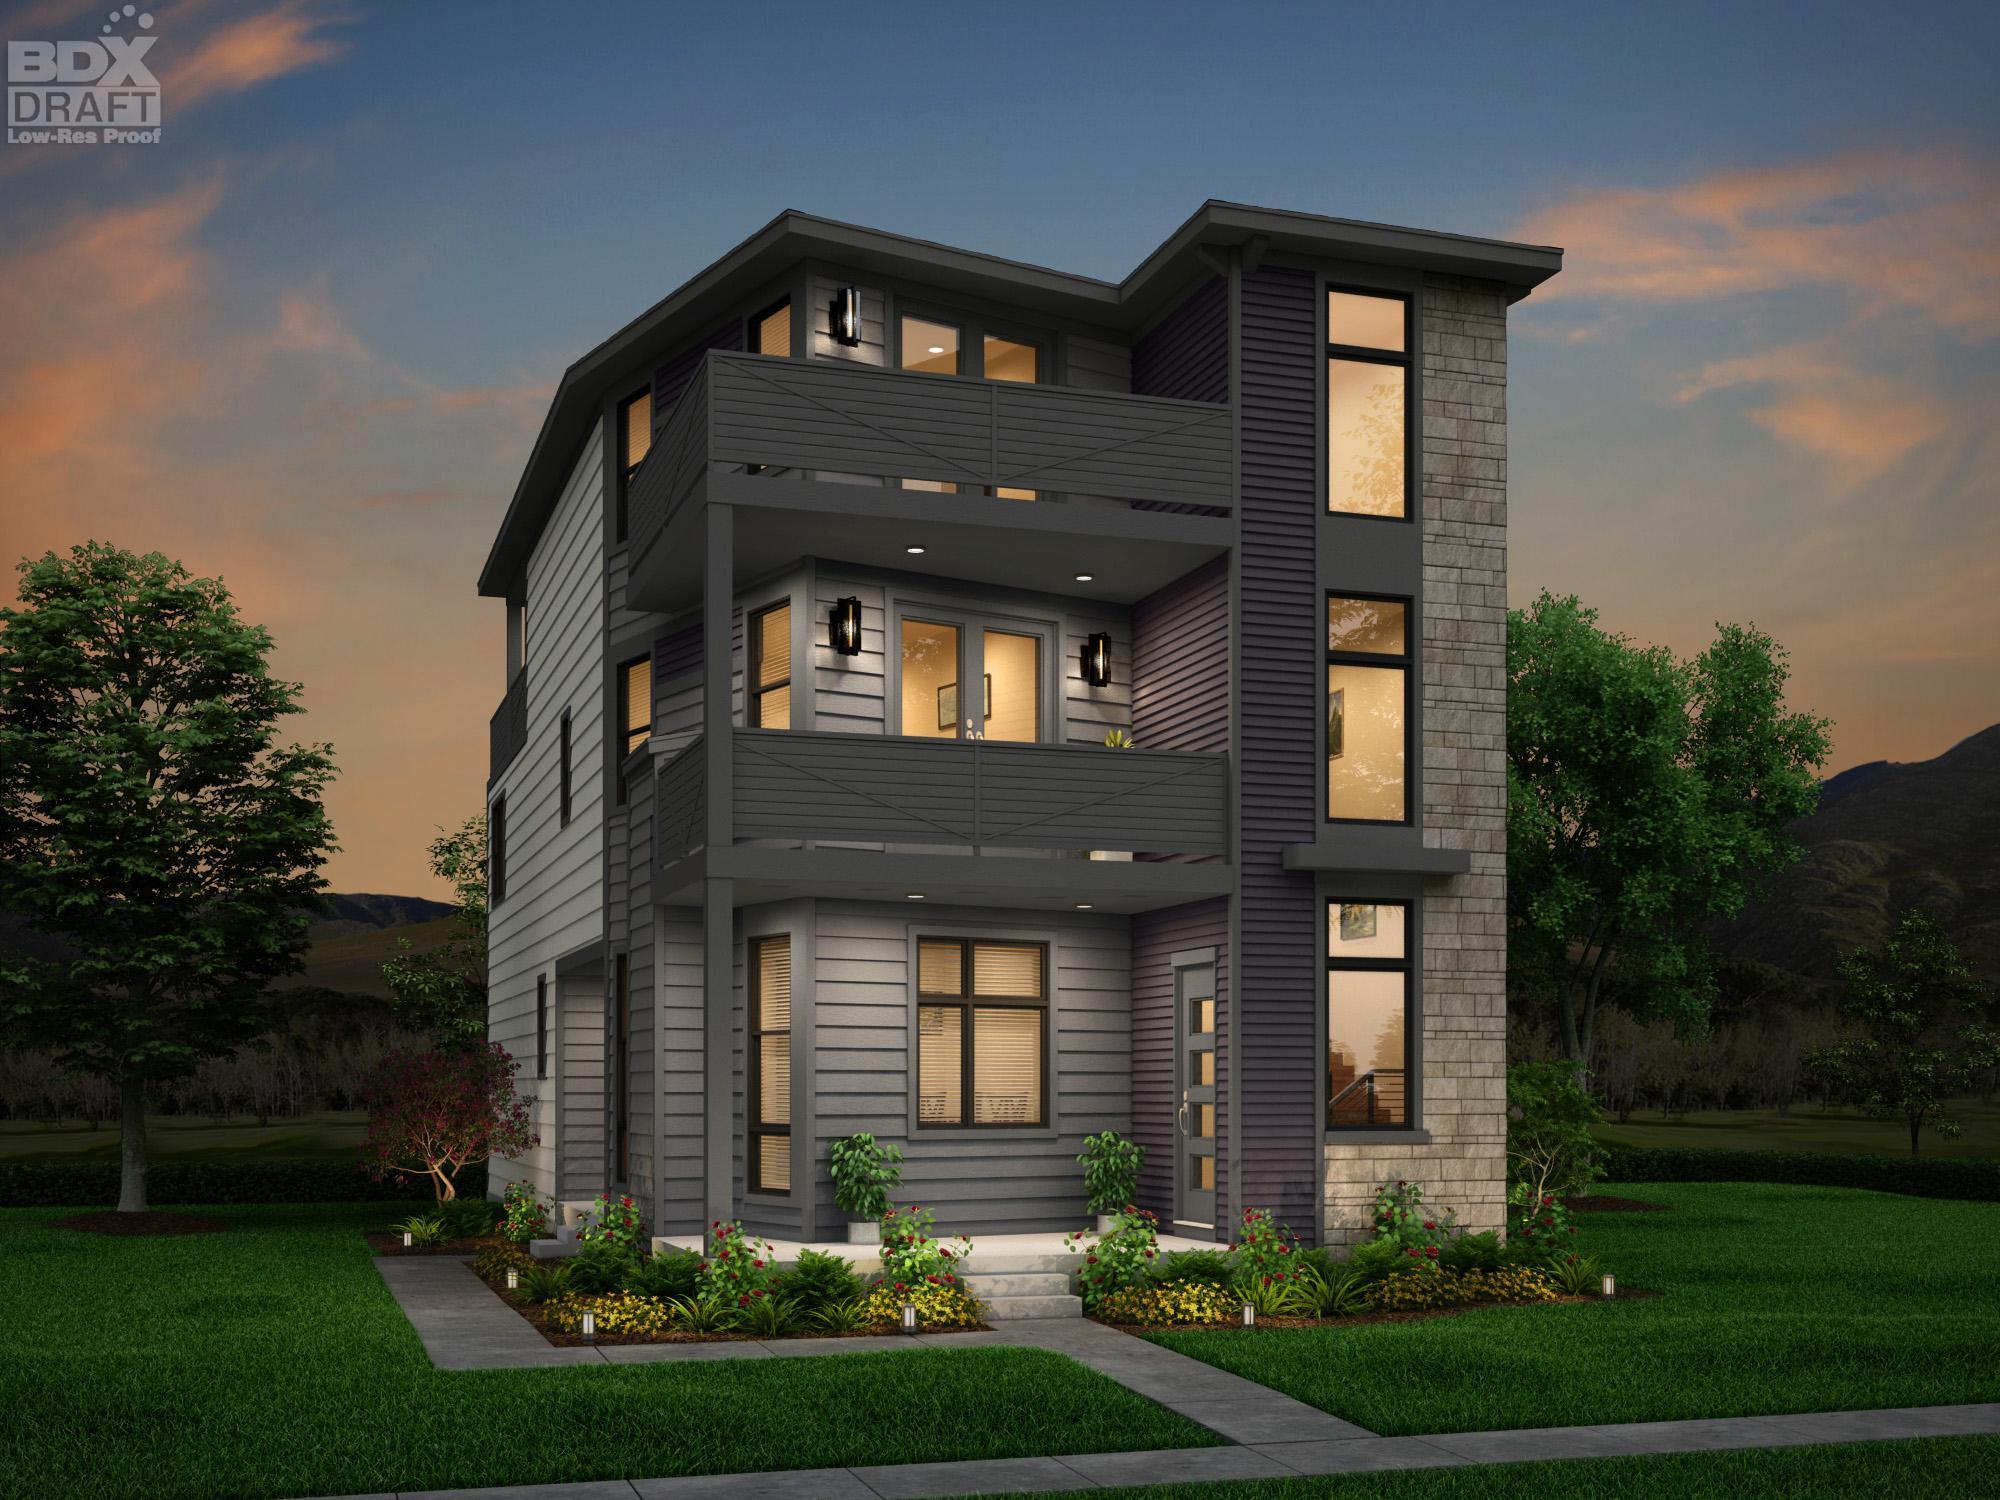 'Painted Prairie' by Epic Homes in Denver